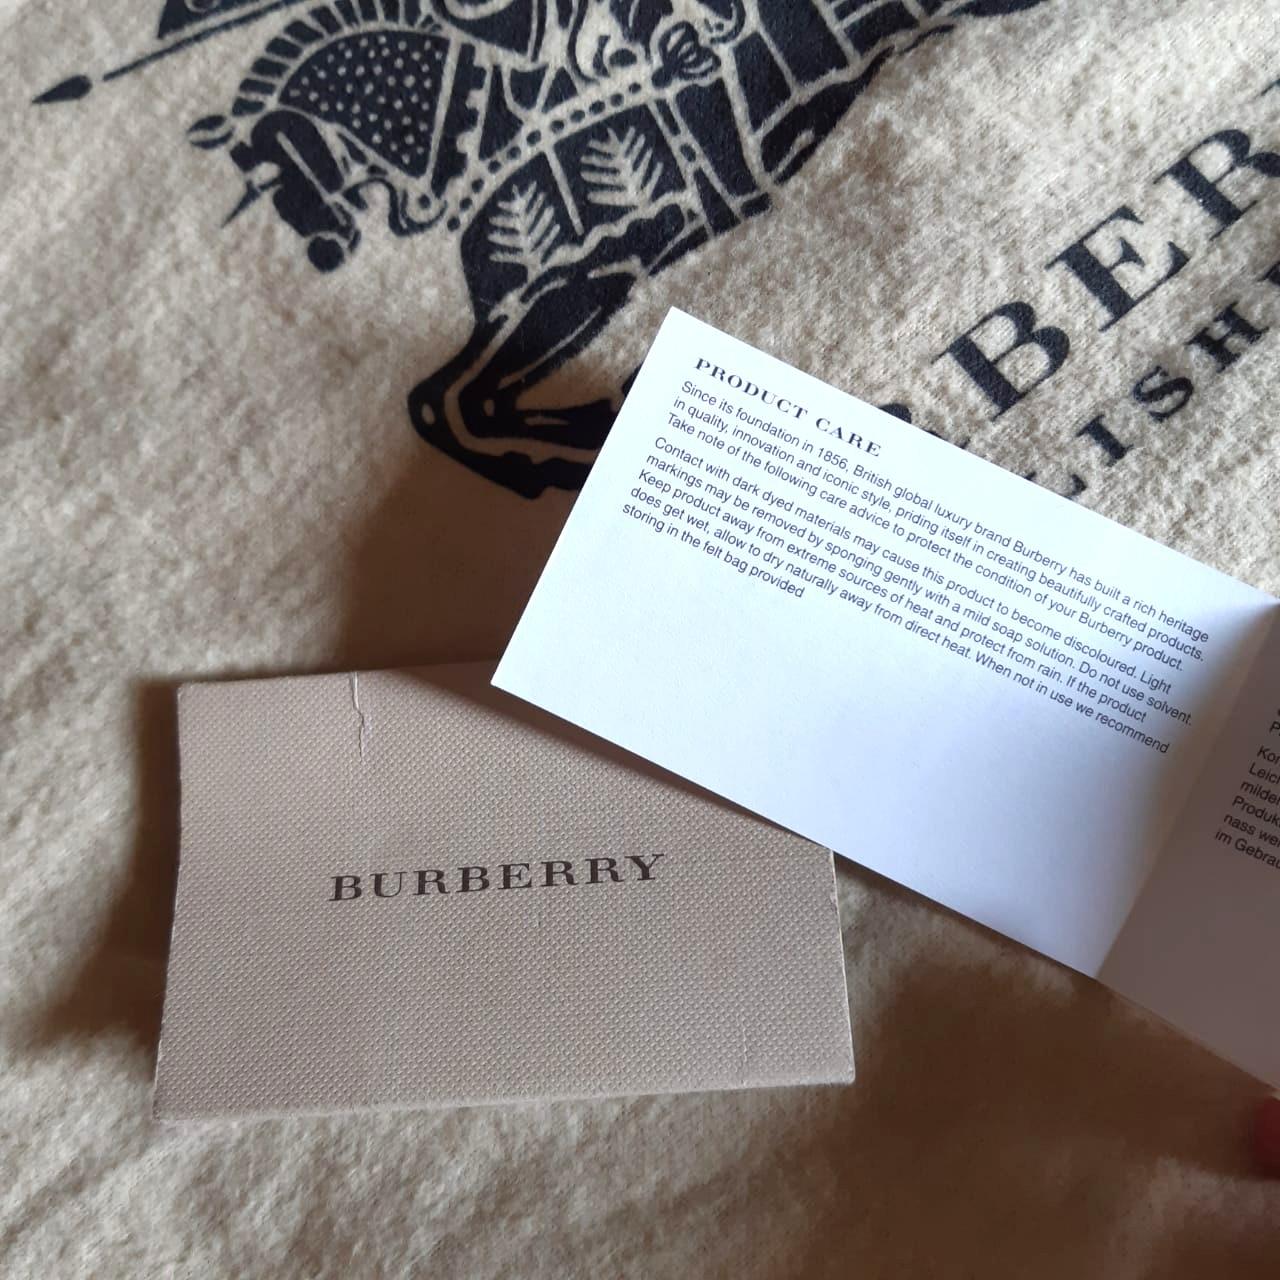 Burberry Nova check red nickie Tote Bag  ORIGINAL from store (Preloved clean / no defect) #awal2020